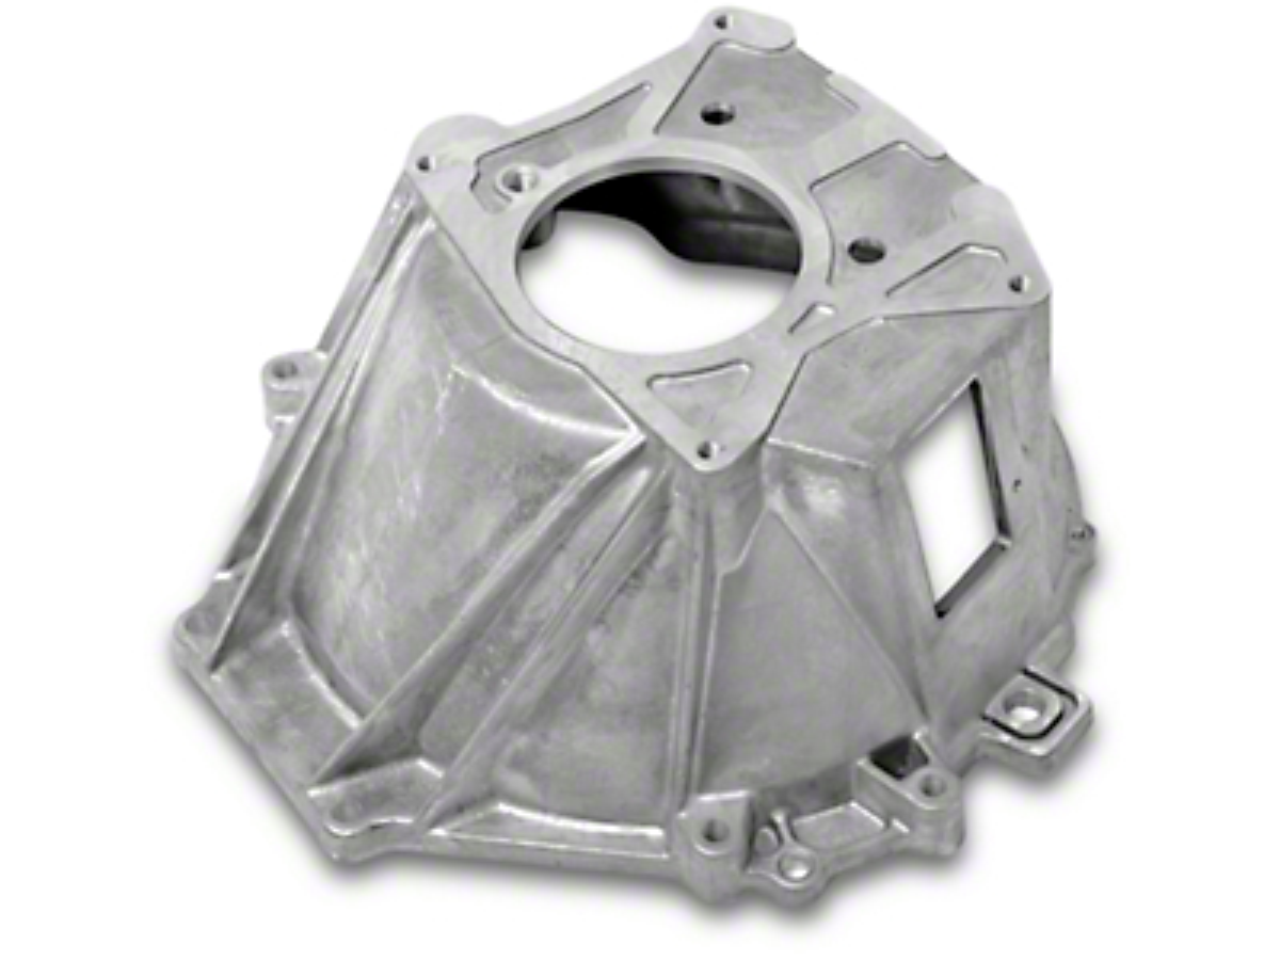 Ford Performance TREMEC 5-Speed Bellhousing (79-95 5.0L, 5.8L)